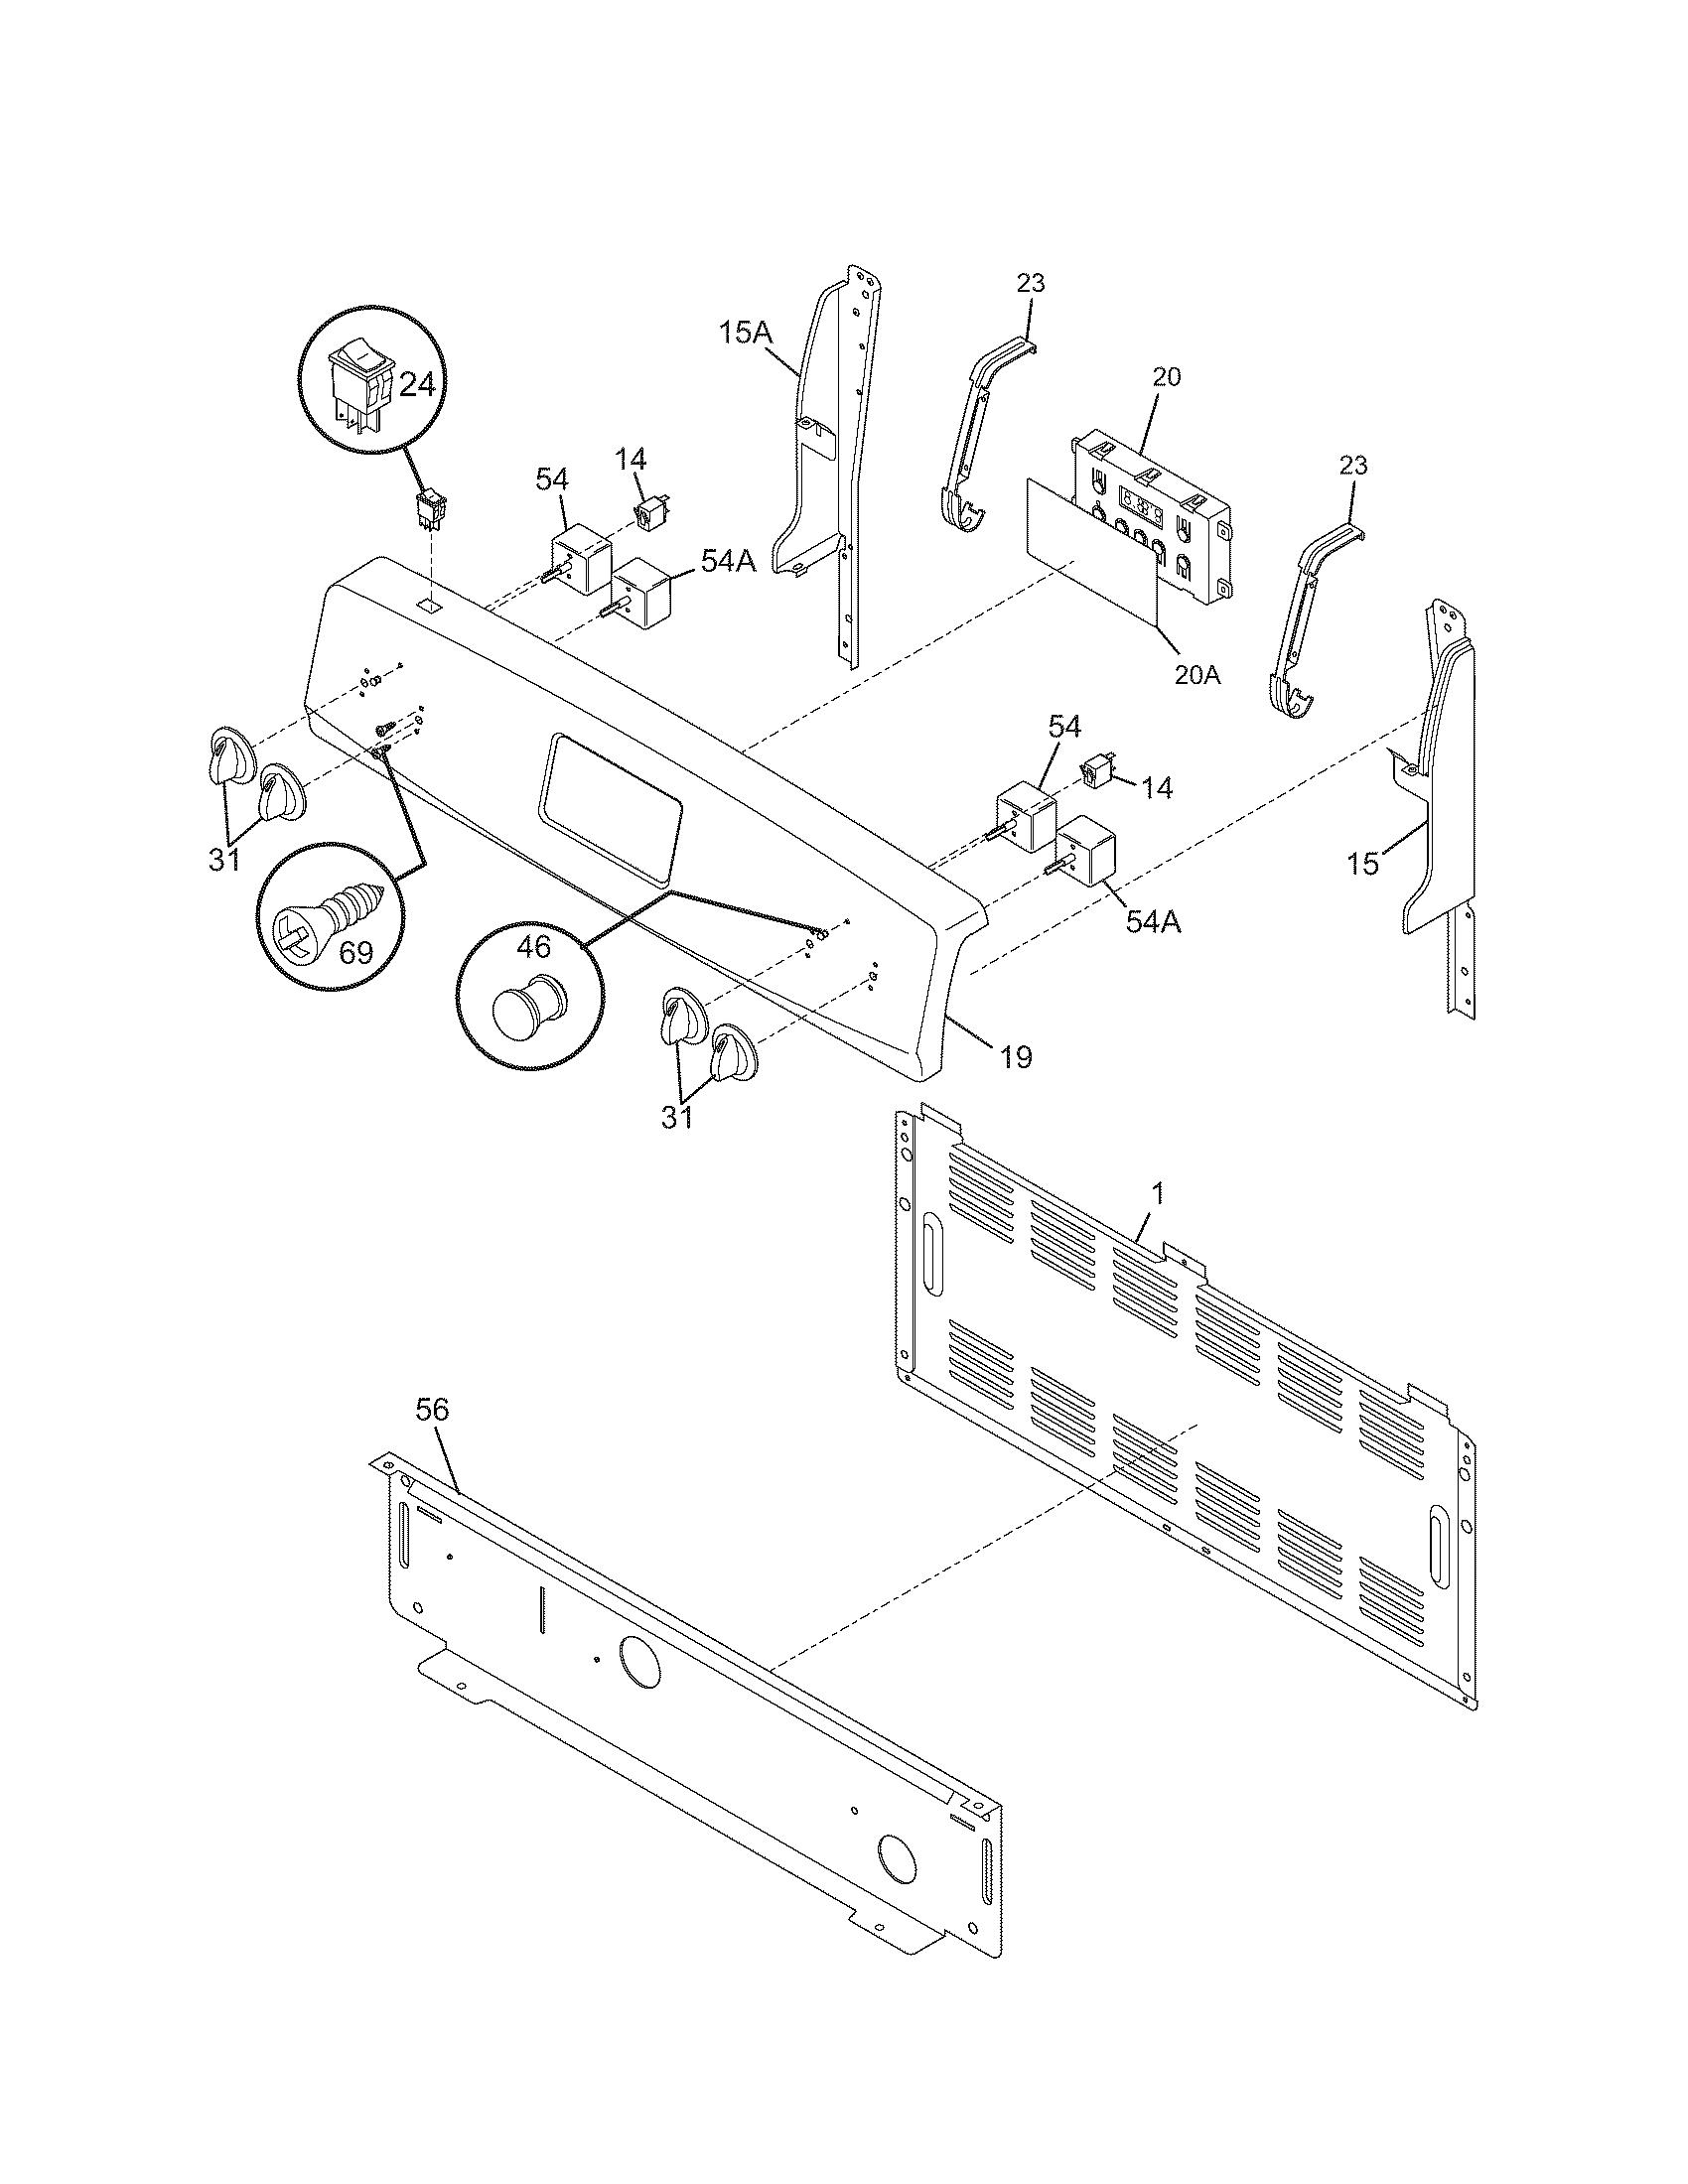 hight resolution of 79095042503 electric range backguard parts diagram